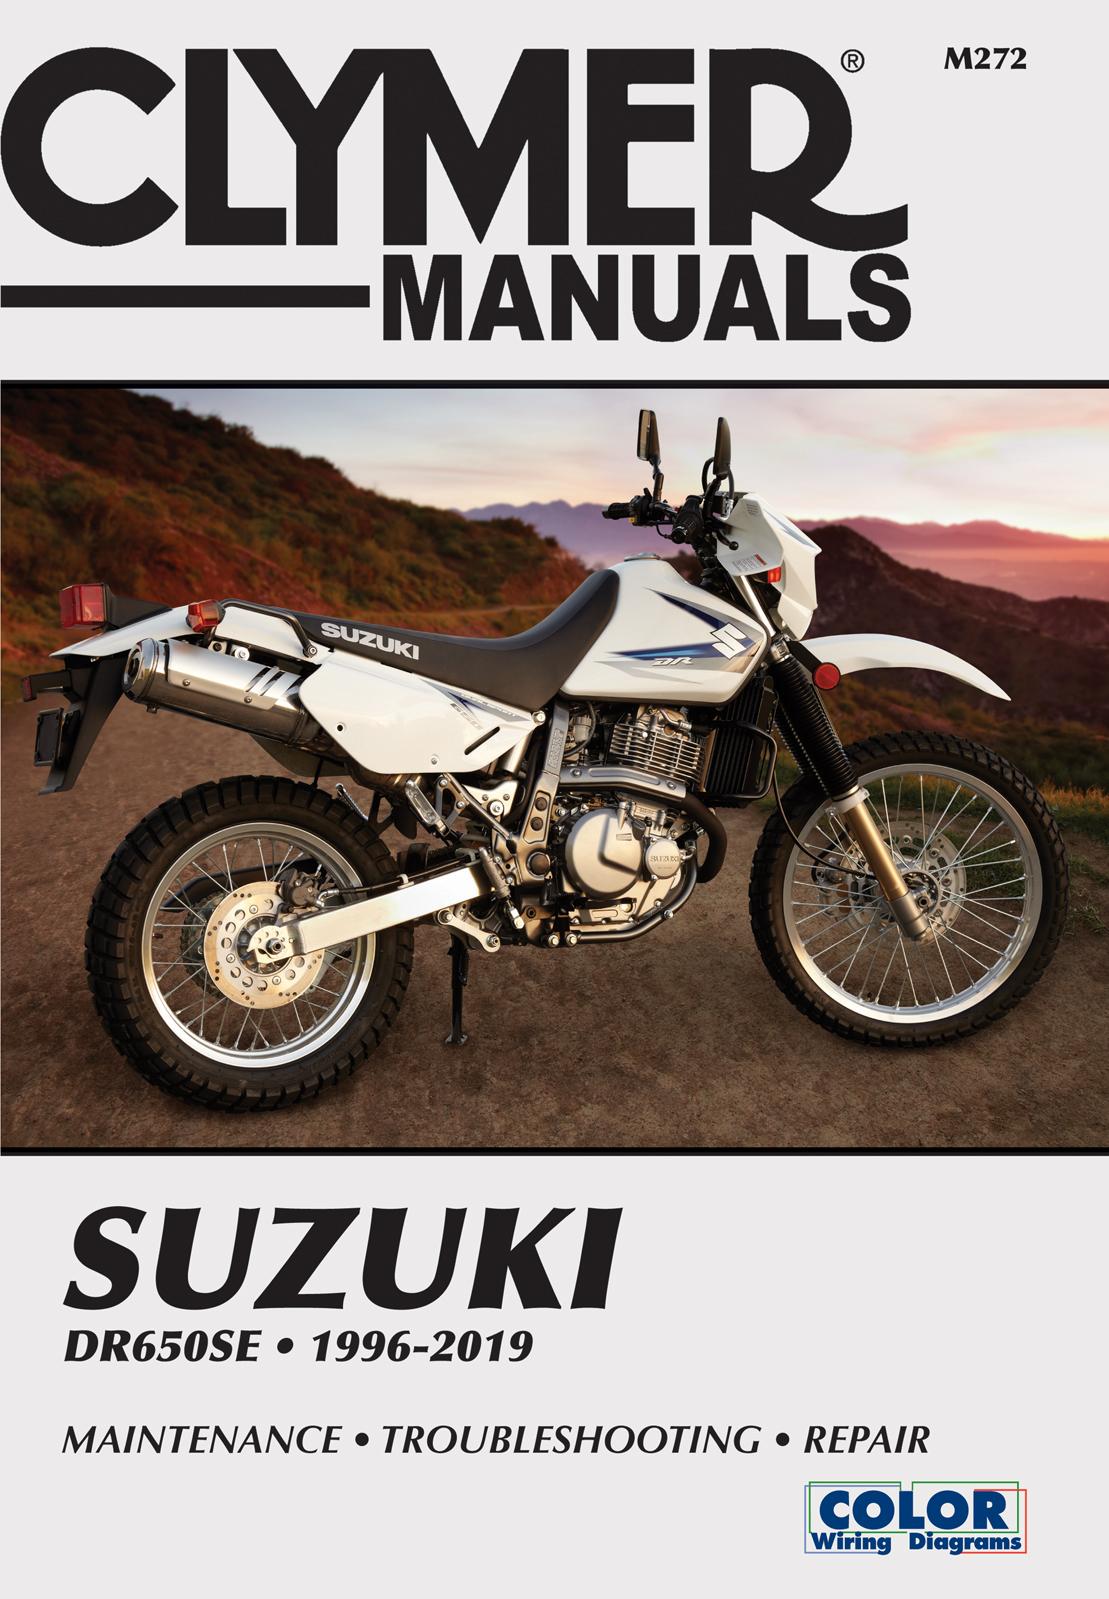 Suzuki DR650 Series Motorcycle (1996-2019) Service Repair Manual